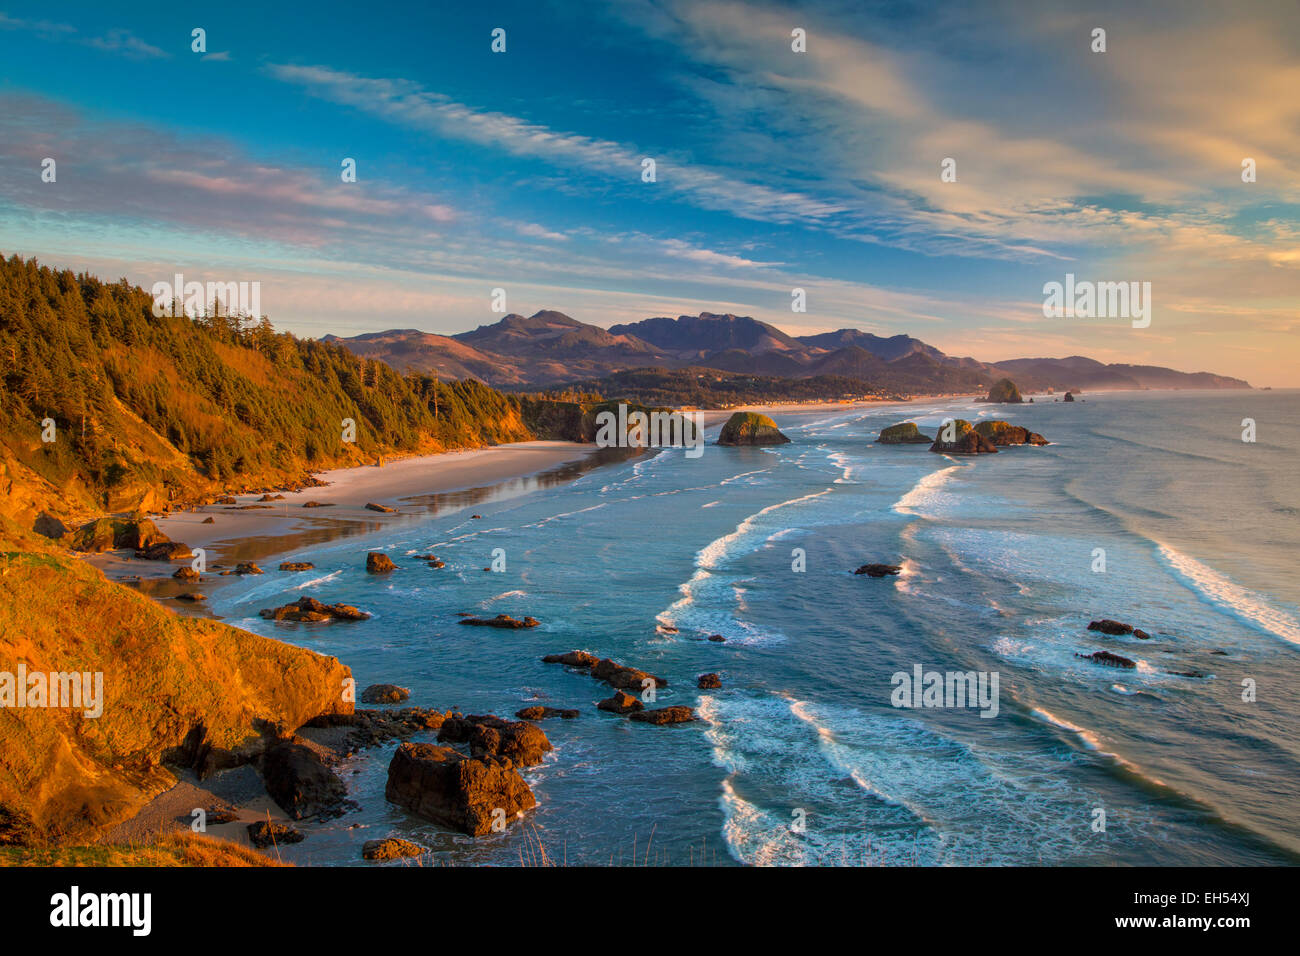 Sunset over the coastline near Cannon Beach, Oregon, USA - Stock Image